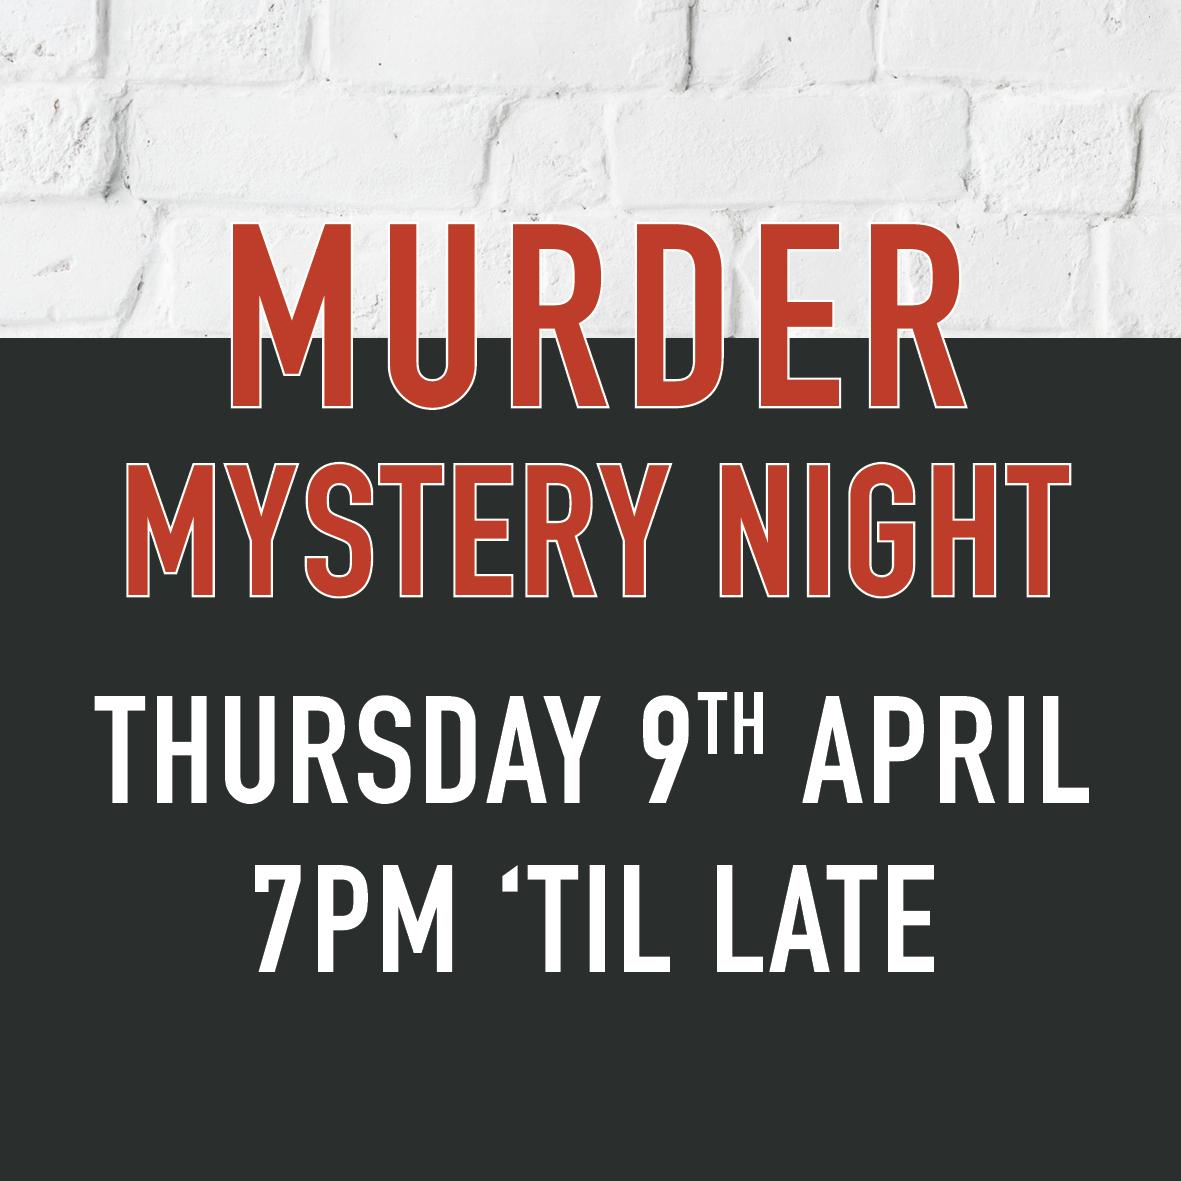 Murder Mystery night roebuck